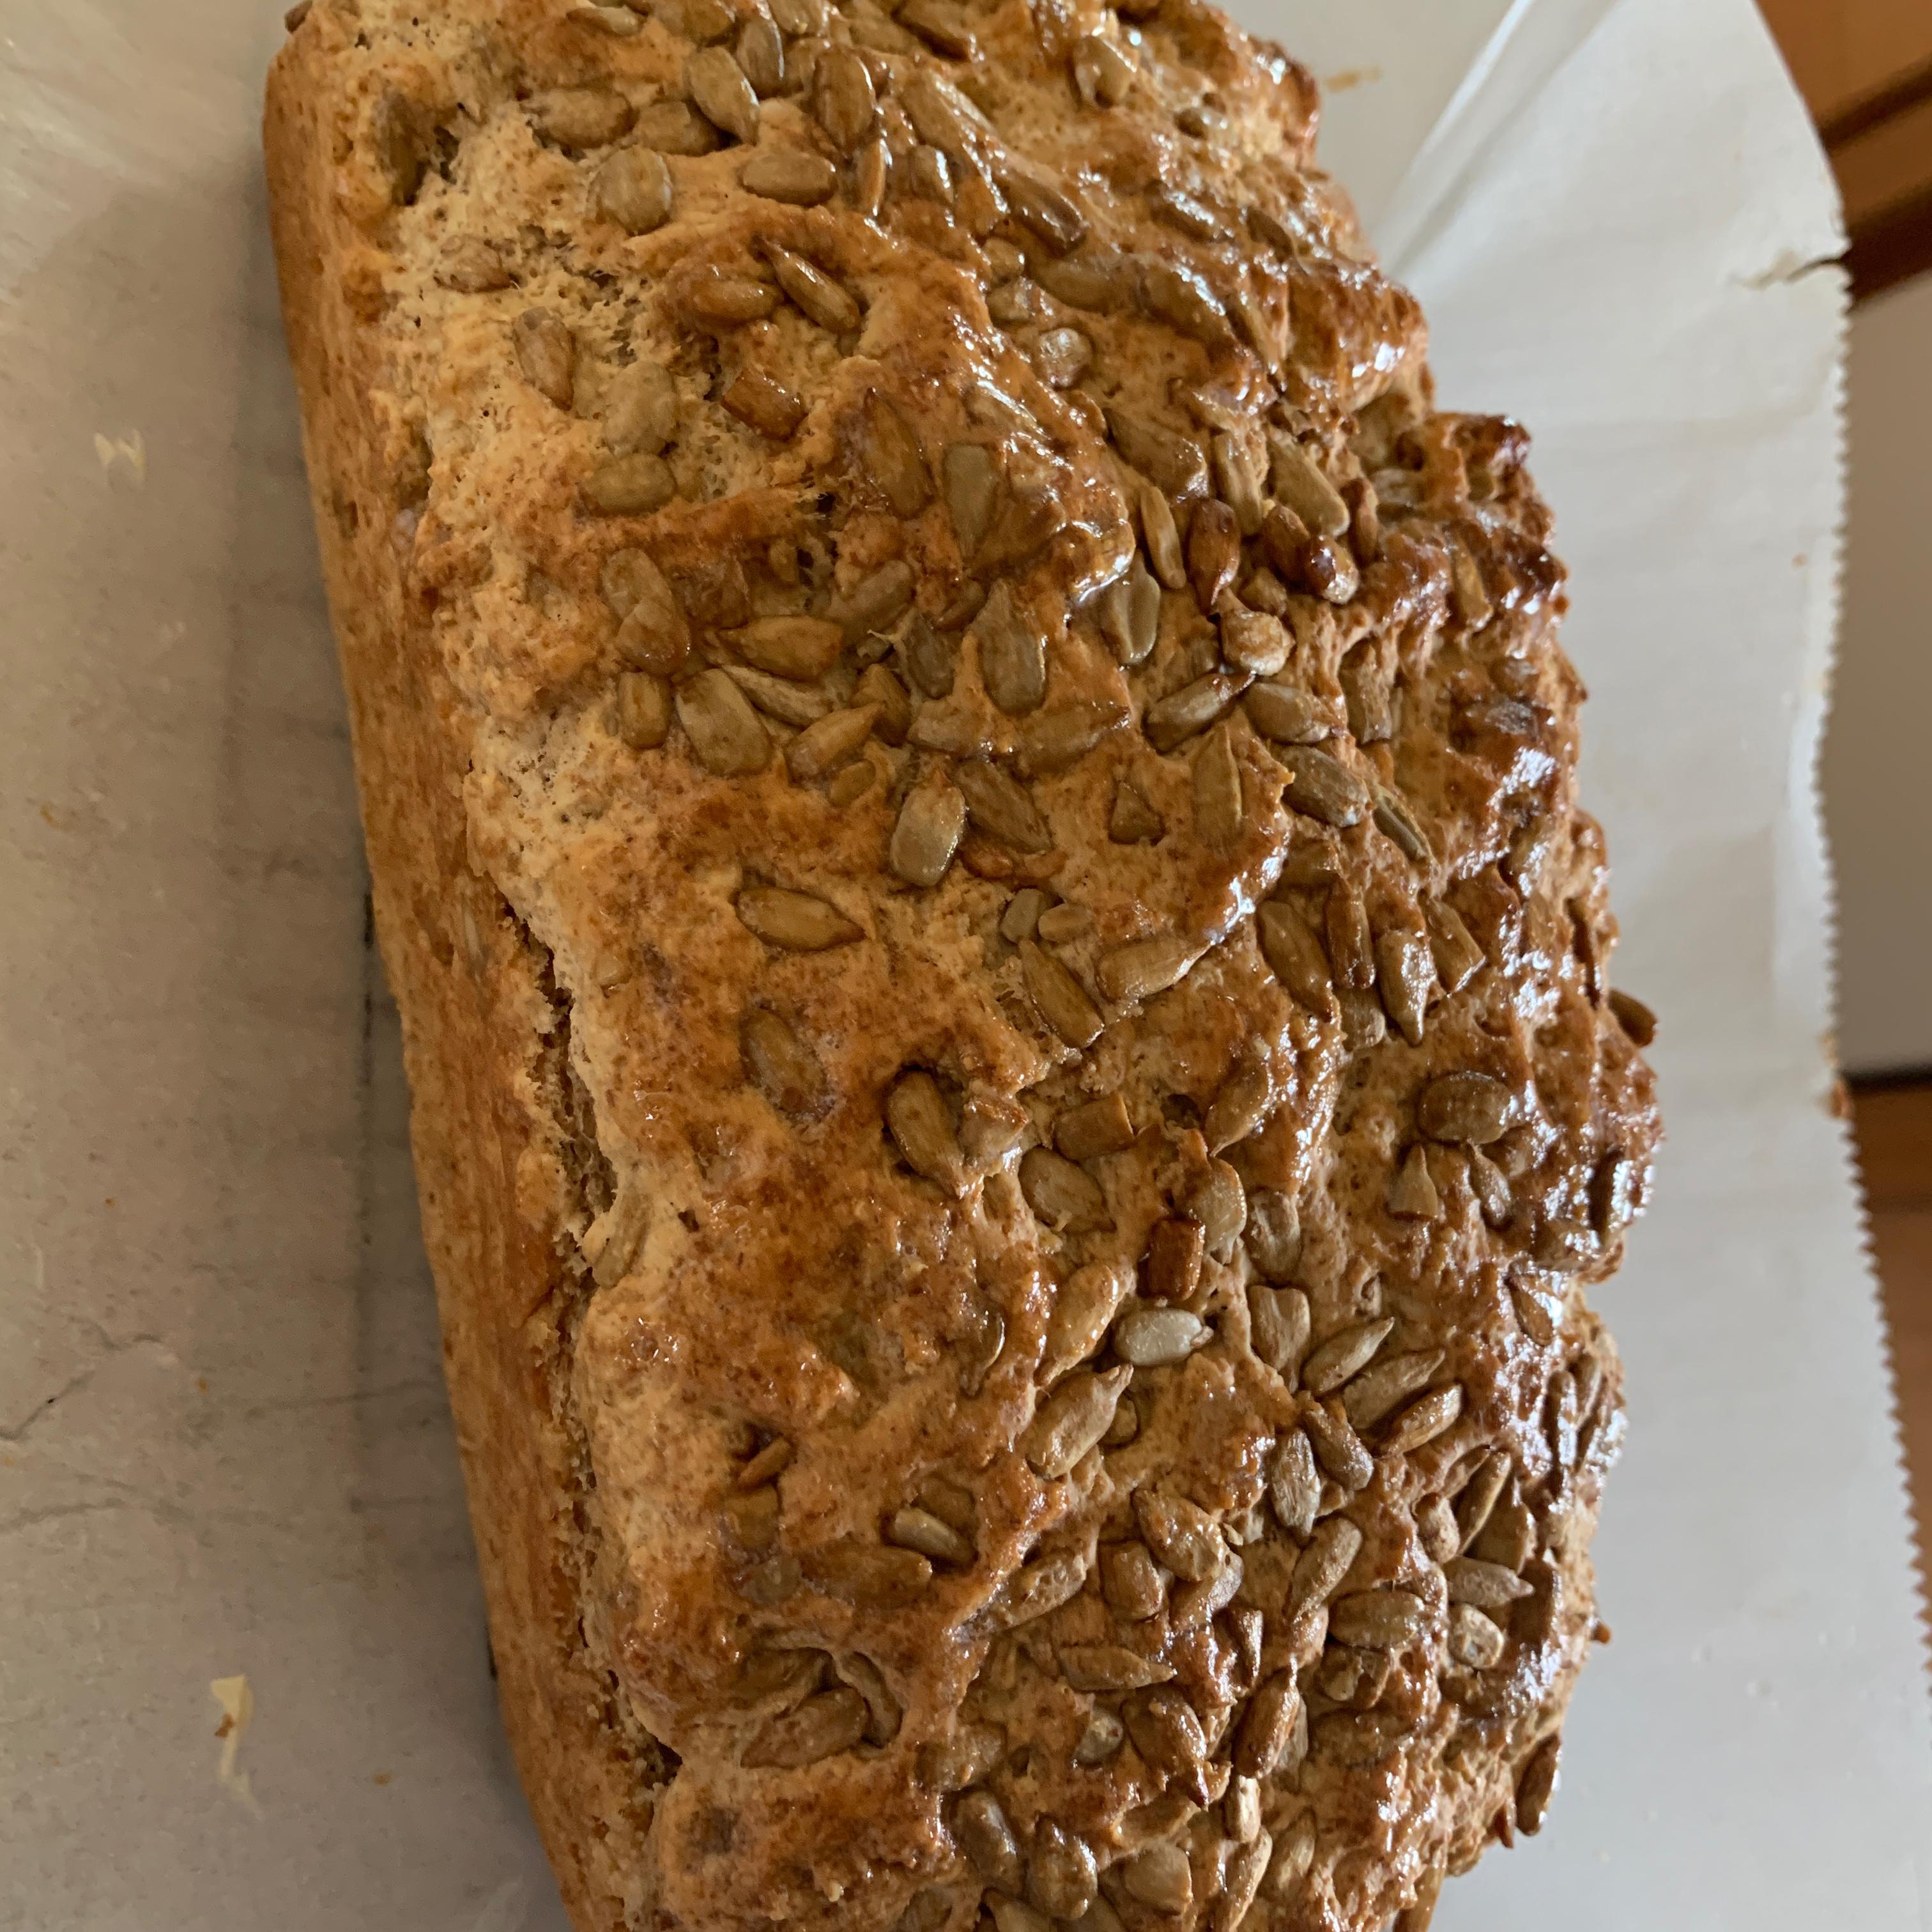 Cowboy Jack's Beer Bread Jc hammy